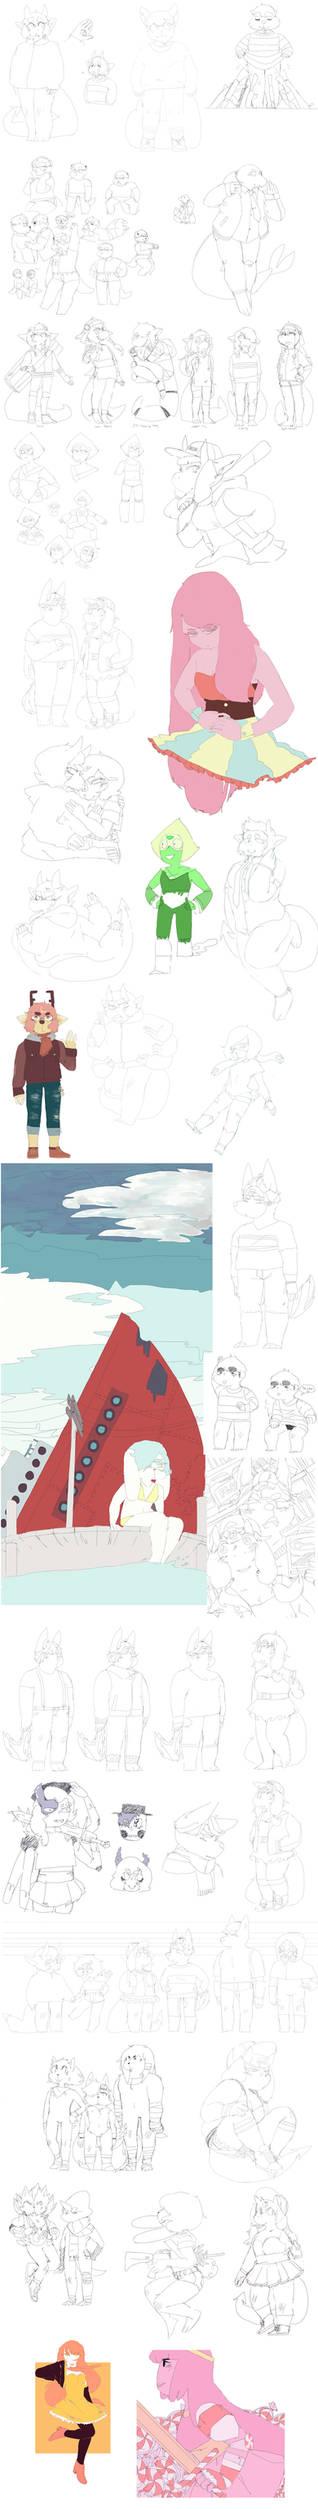 summer 2015 sketch